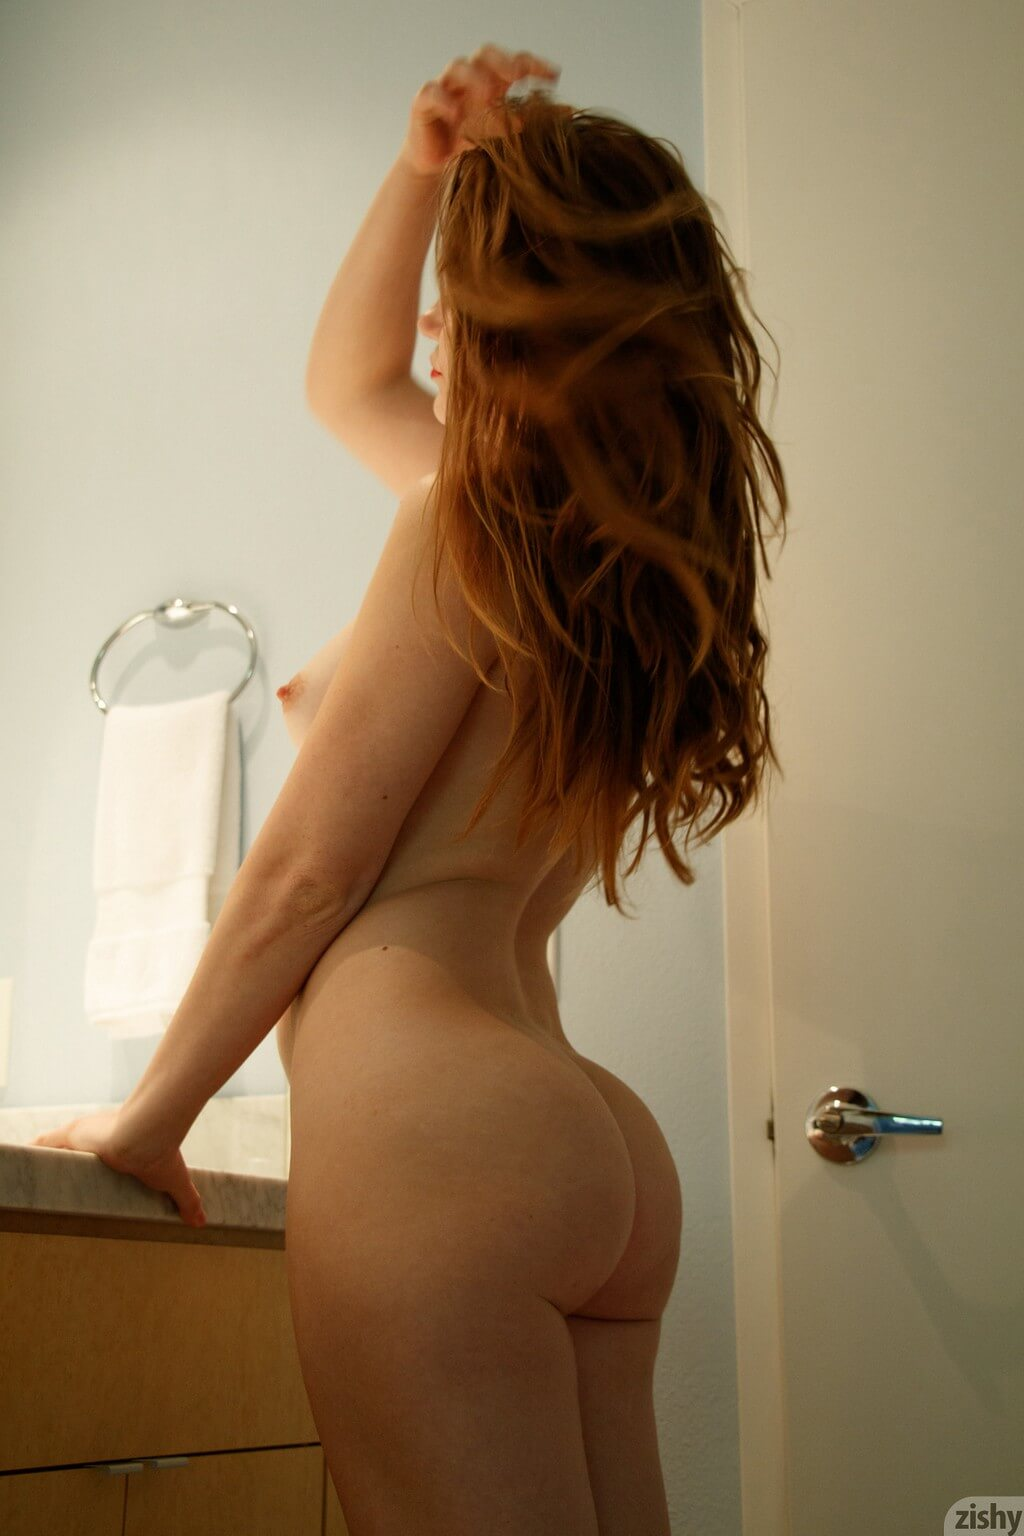 Amateur nude babe Misty Lovelace sexy by Zishy (gallery)